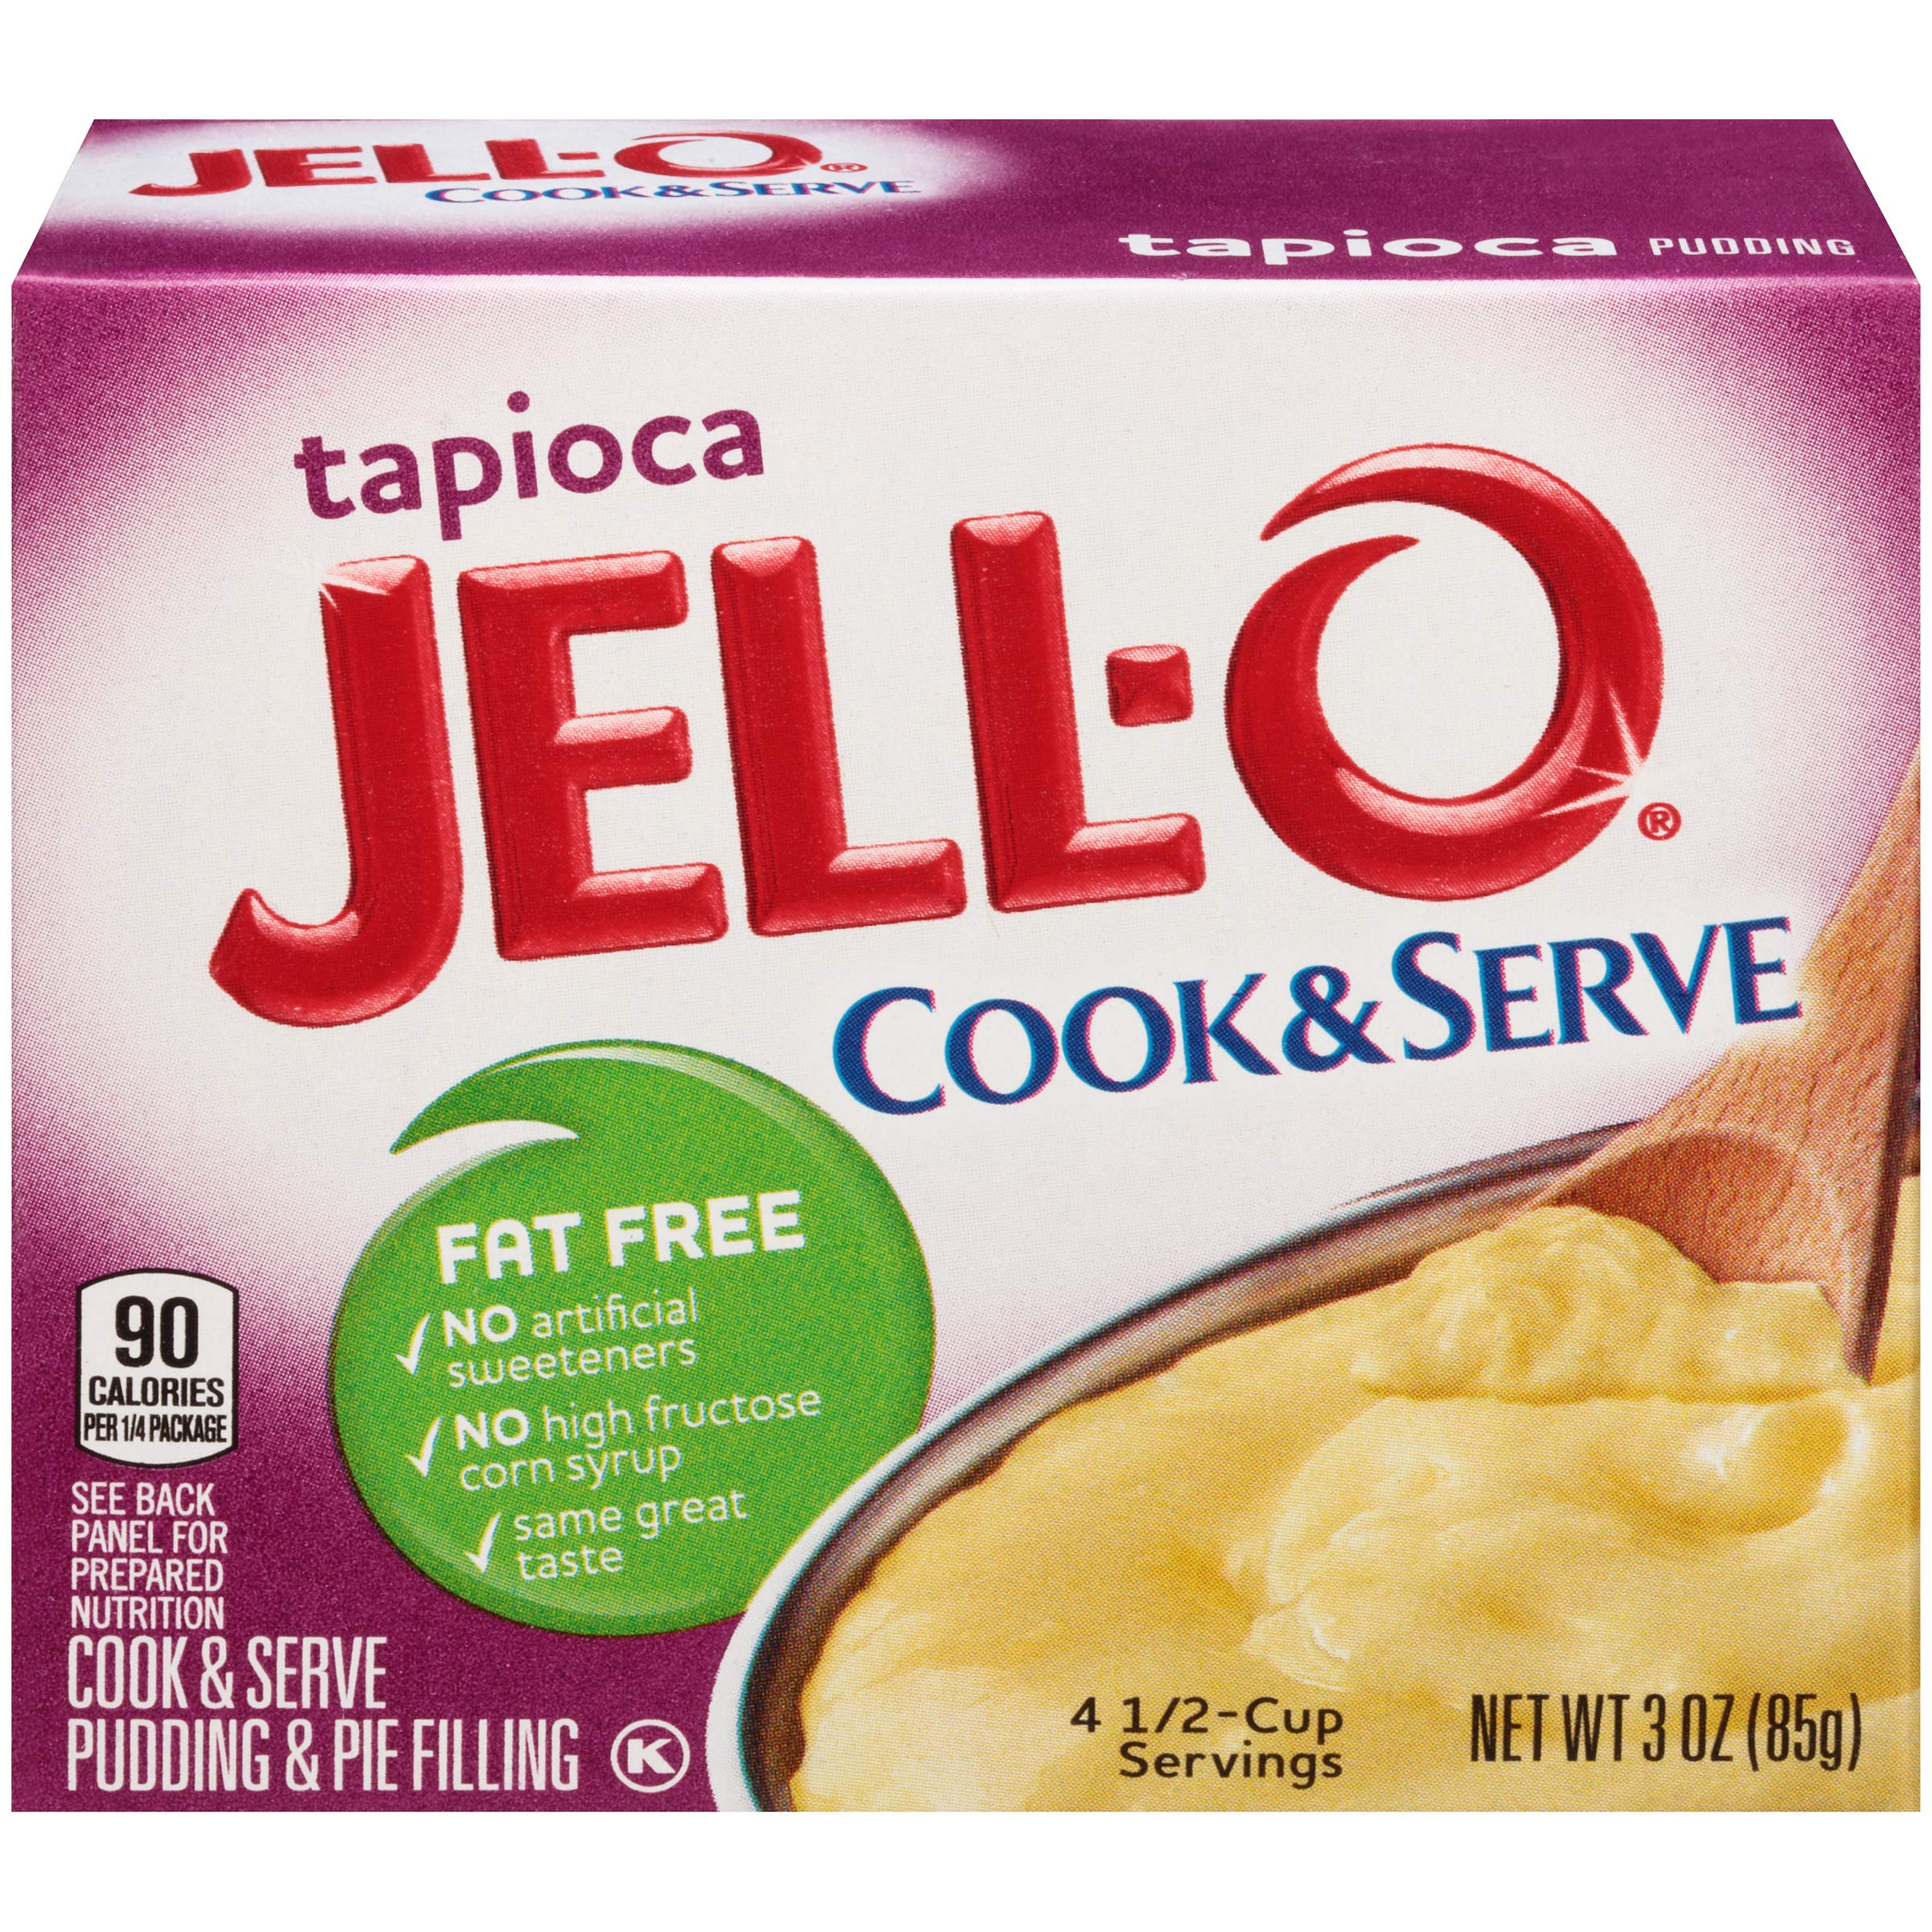 Jell-O Fat Free Cook & Serve Tapioca Pudding, 3 oz Box